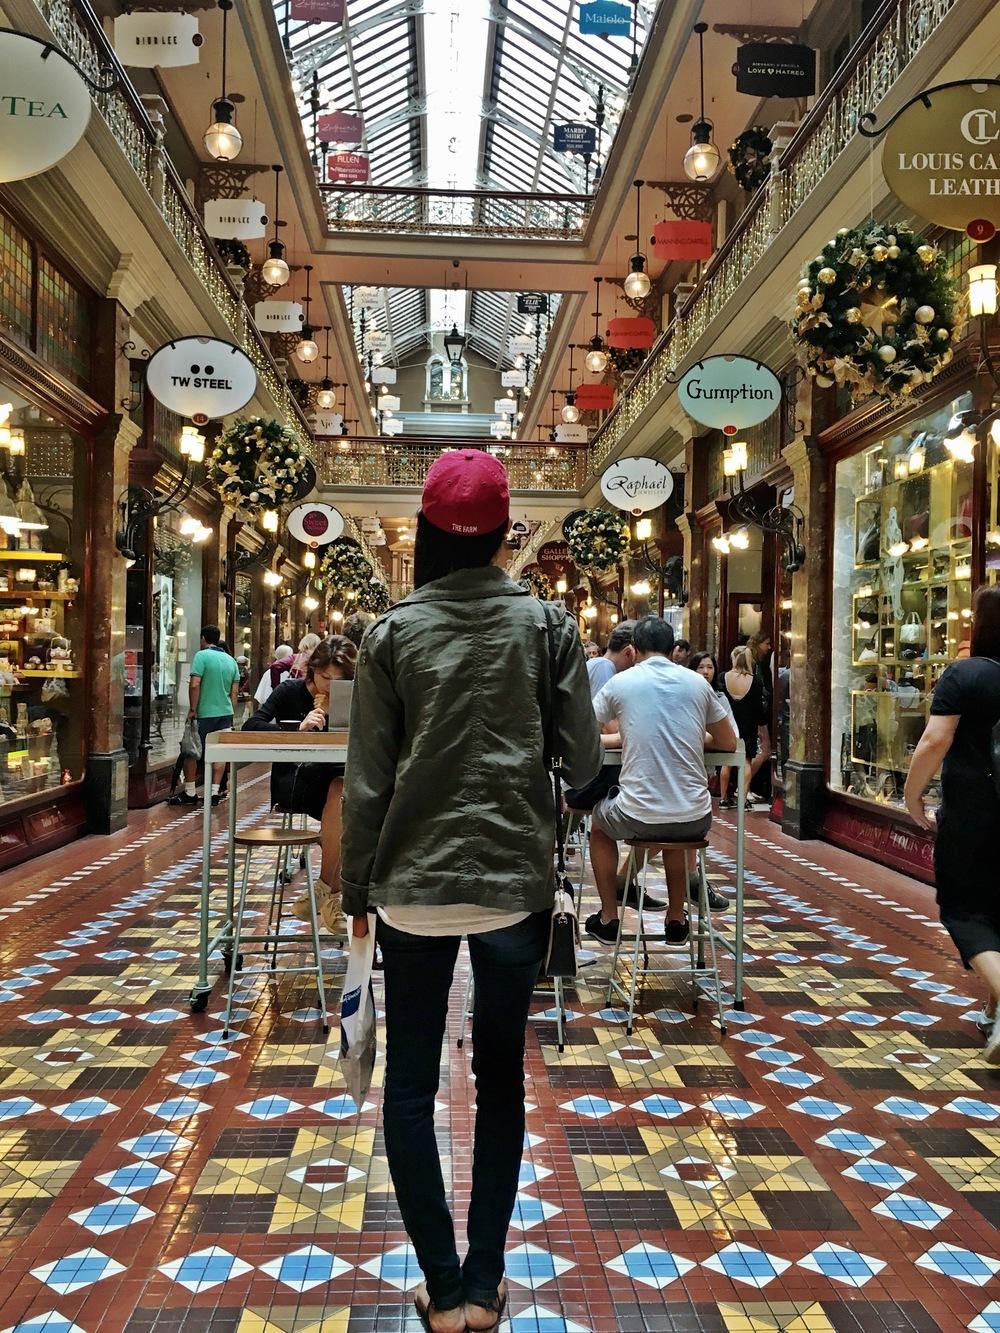 Strand Arcade